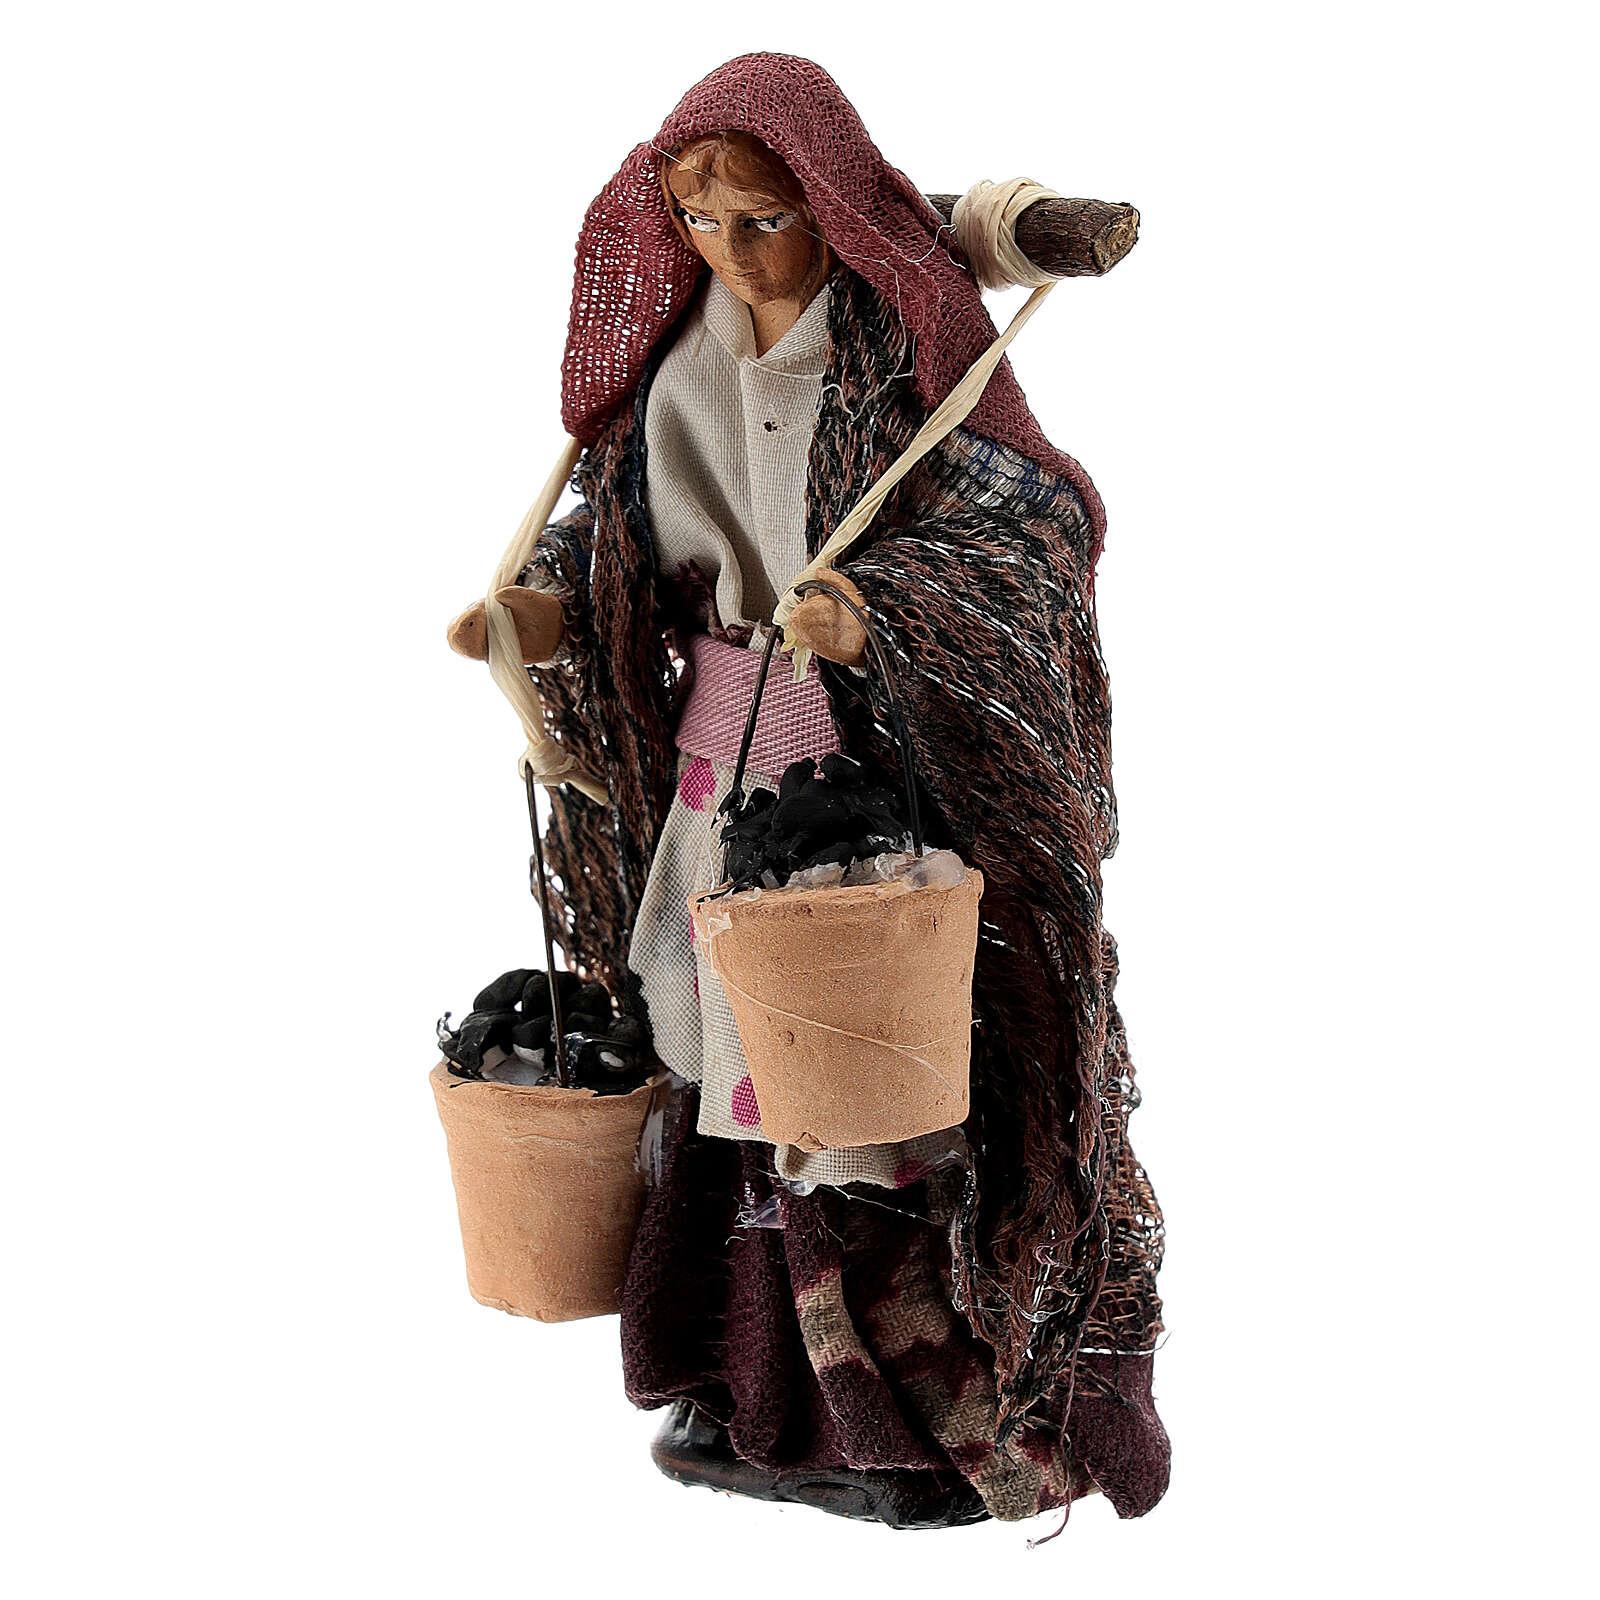 Woman with coal baskets 8 cm Neapolitan nativity figurine 4